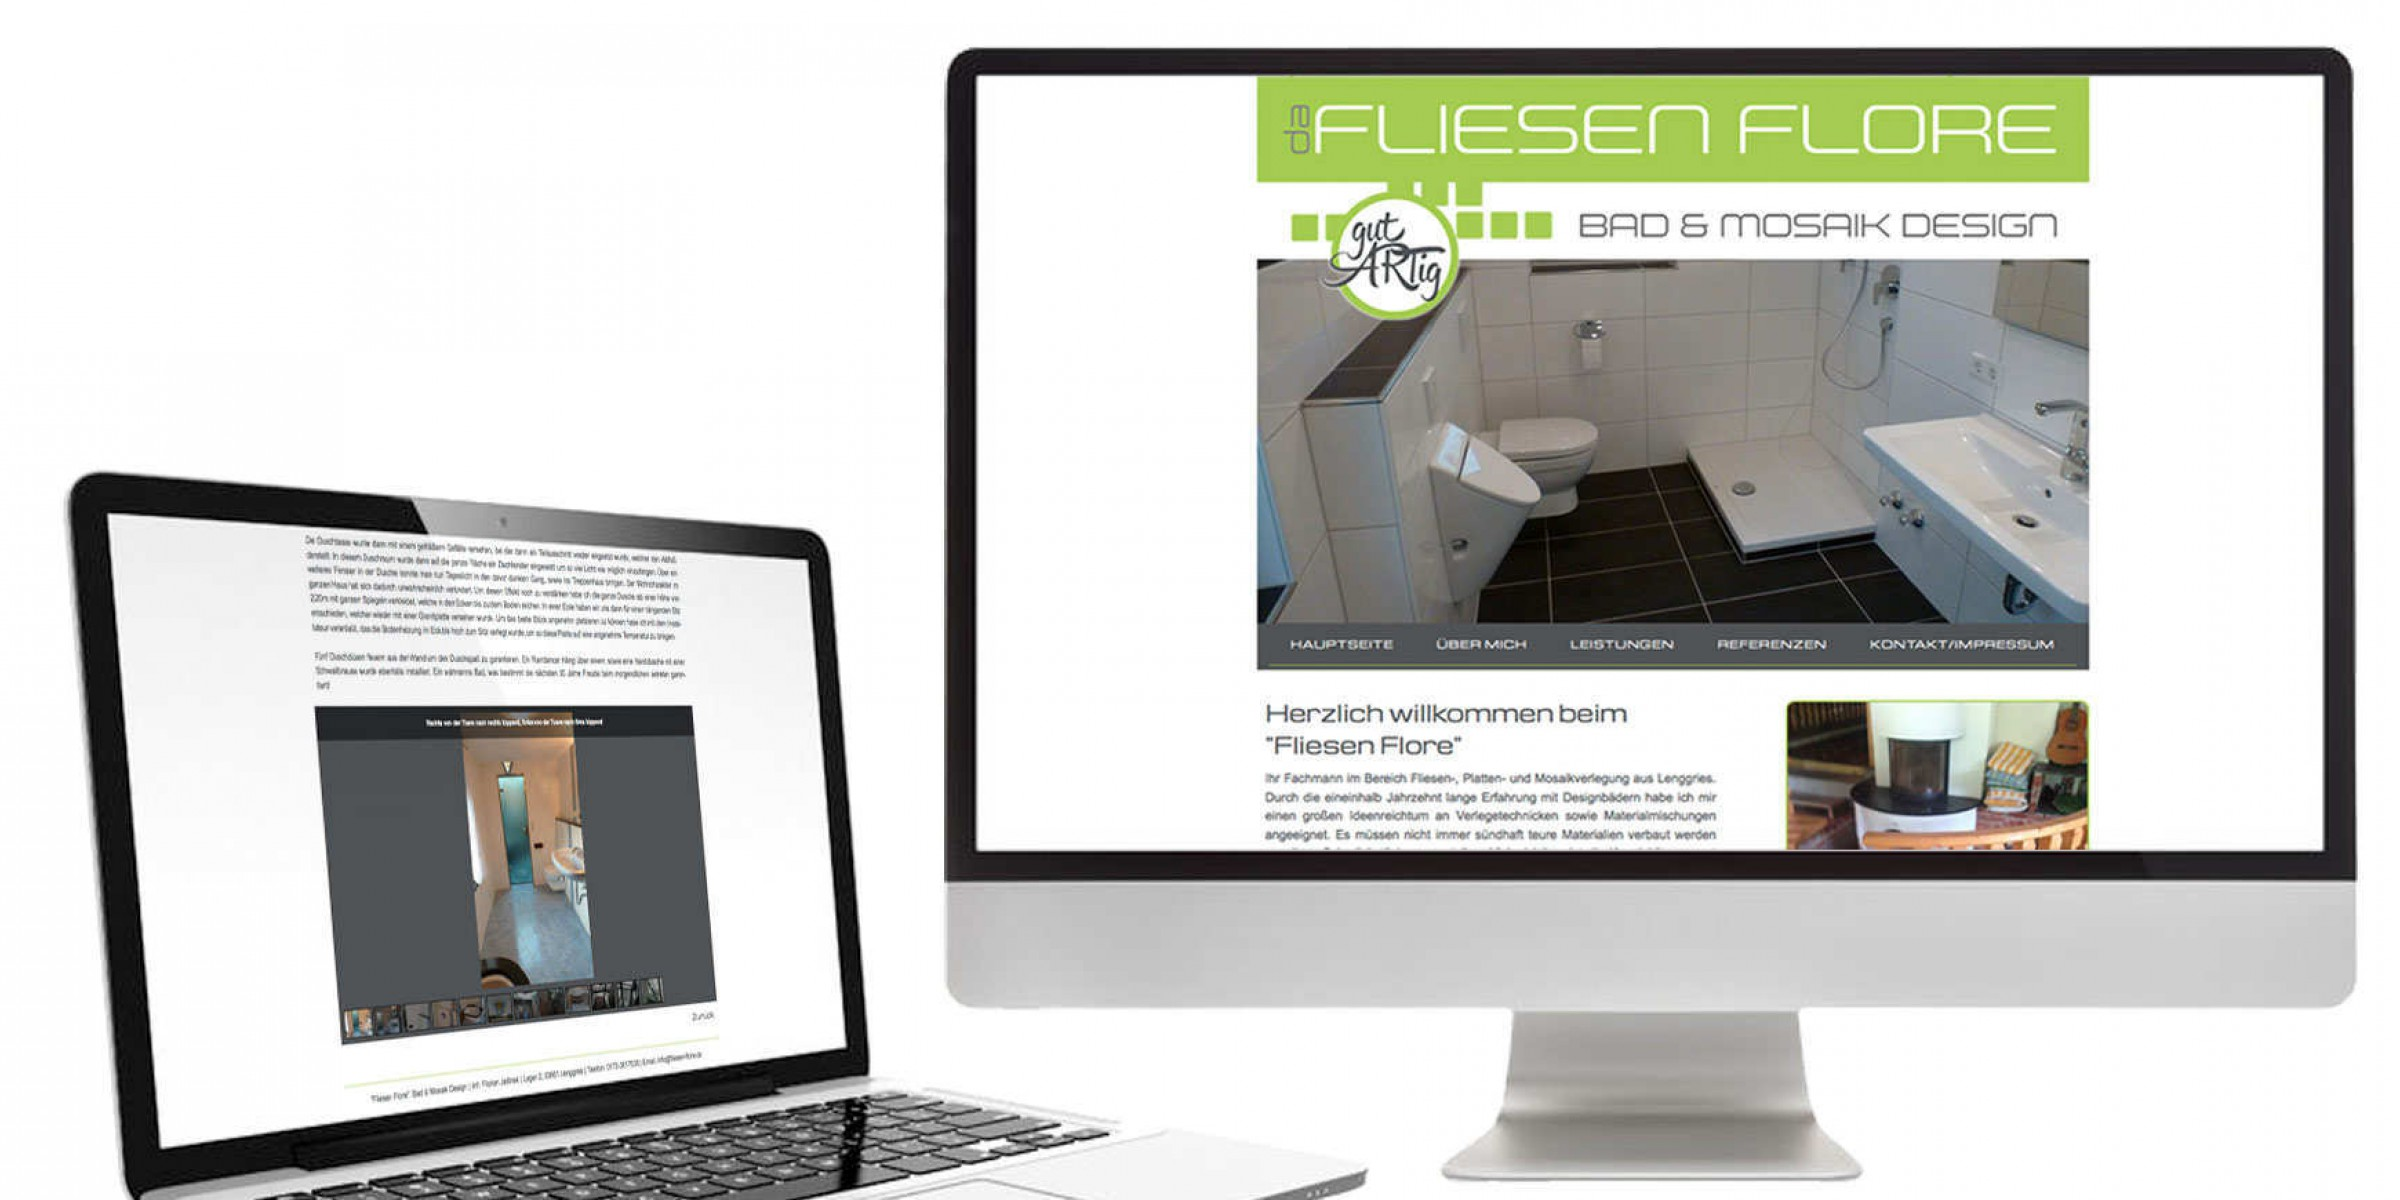 Webdesign Münchentegernseegmundmiesbachbad Tölz Seo